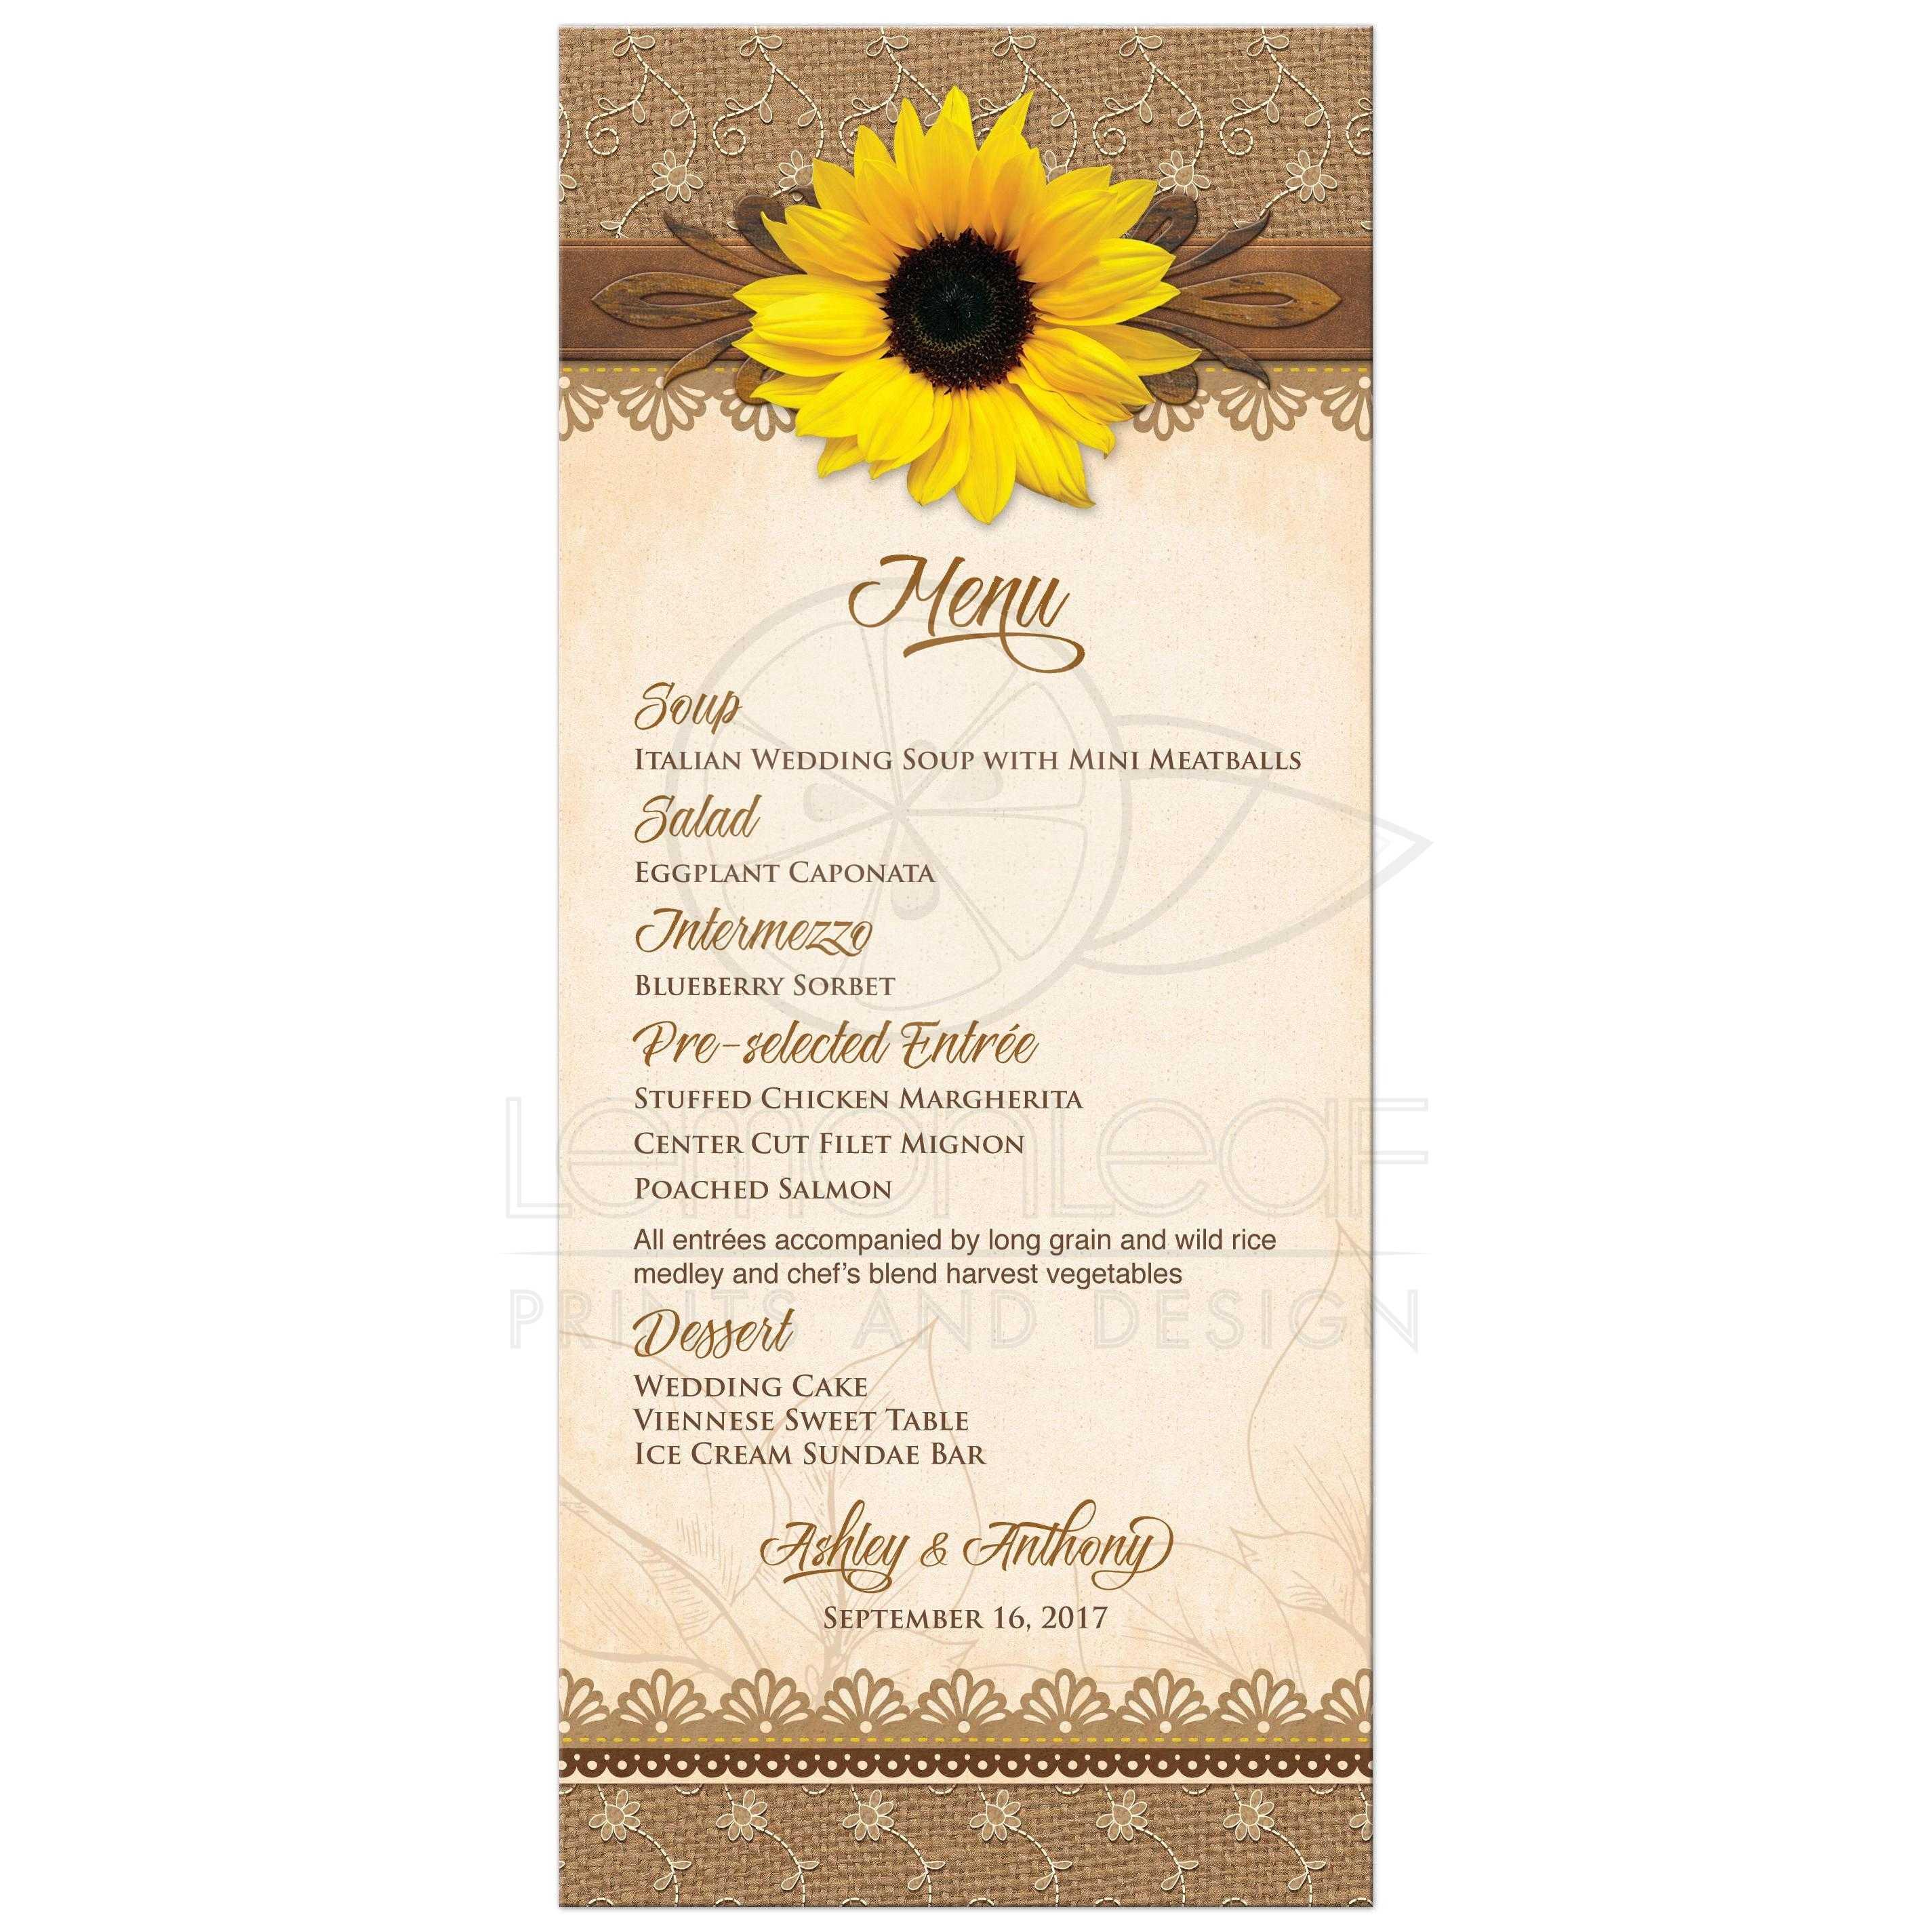 Wedding Menu Rustic Sunflower Burlap Lace Wood